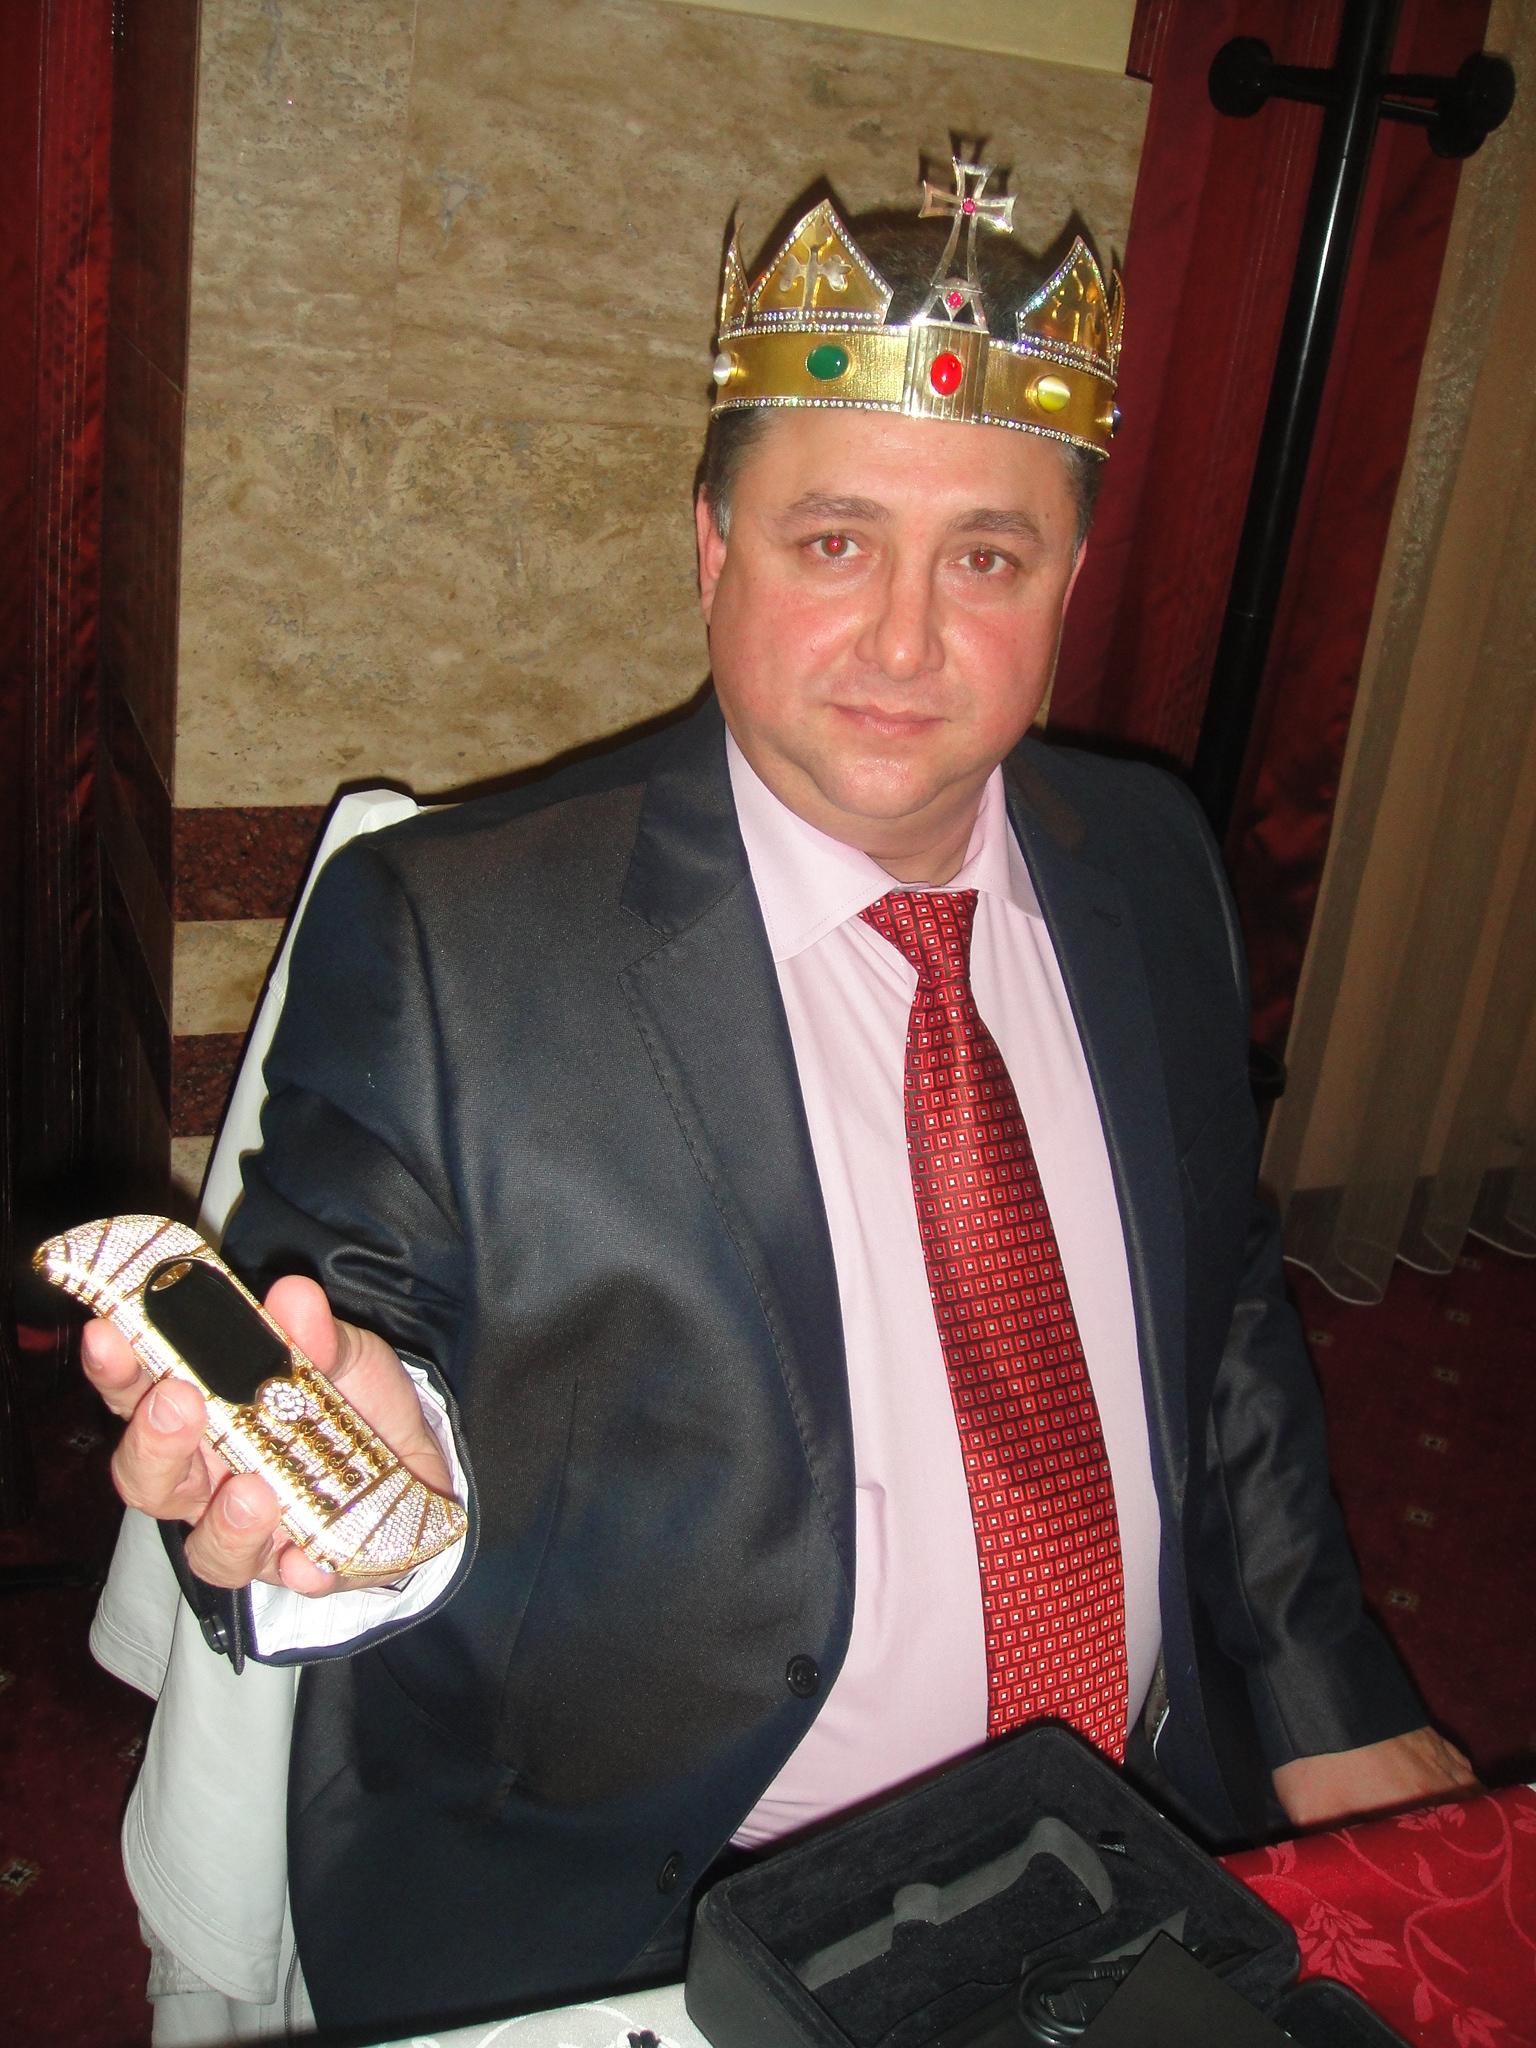 Dan Stanescu si-a asortat la coroana un telefon din aur